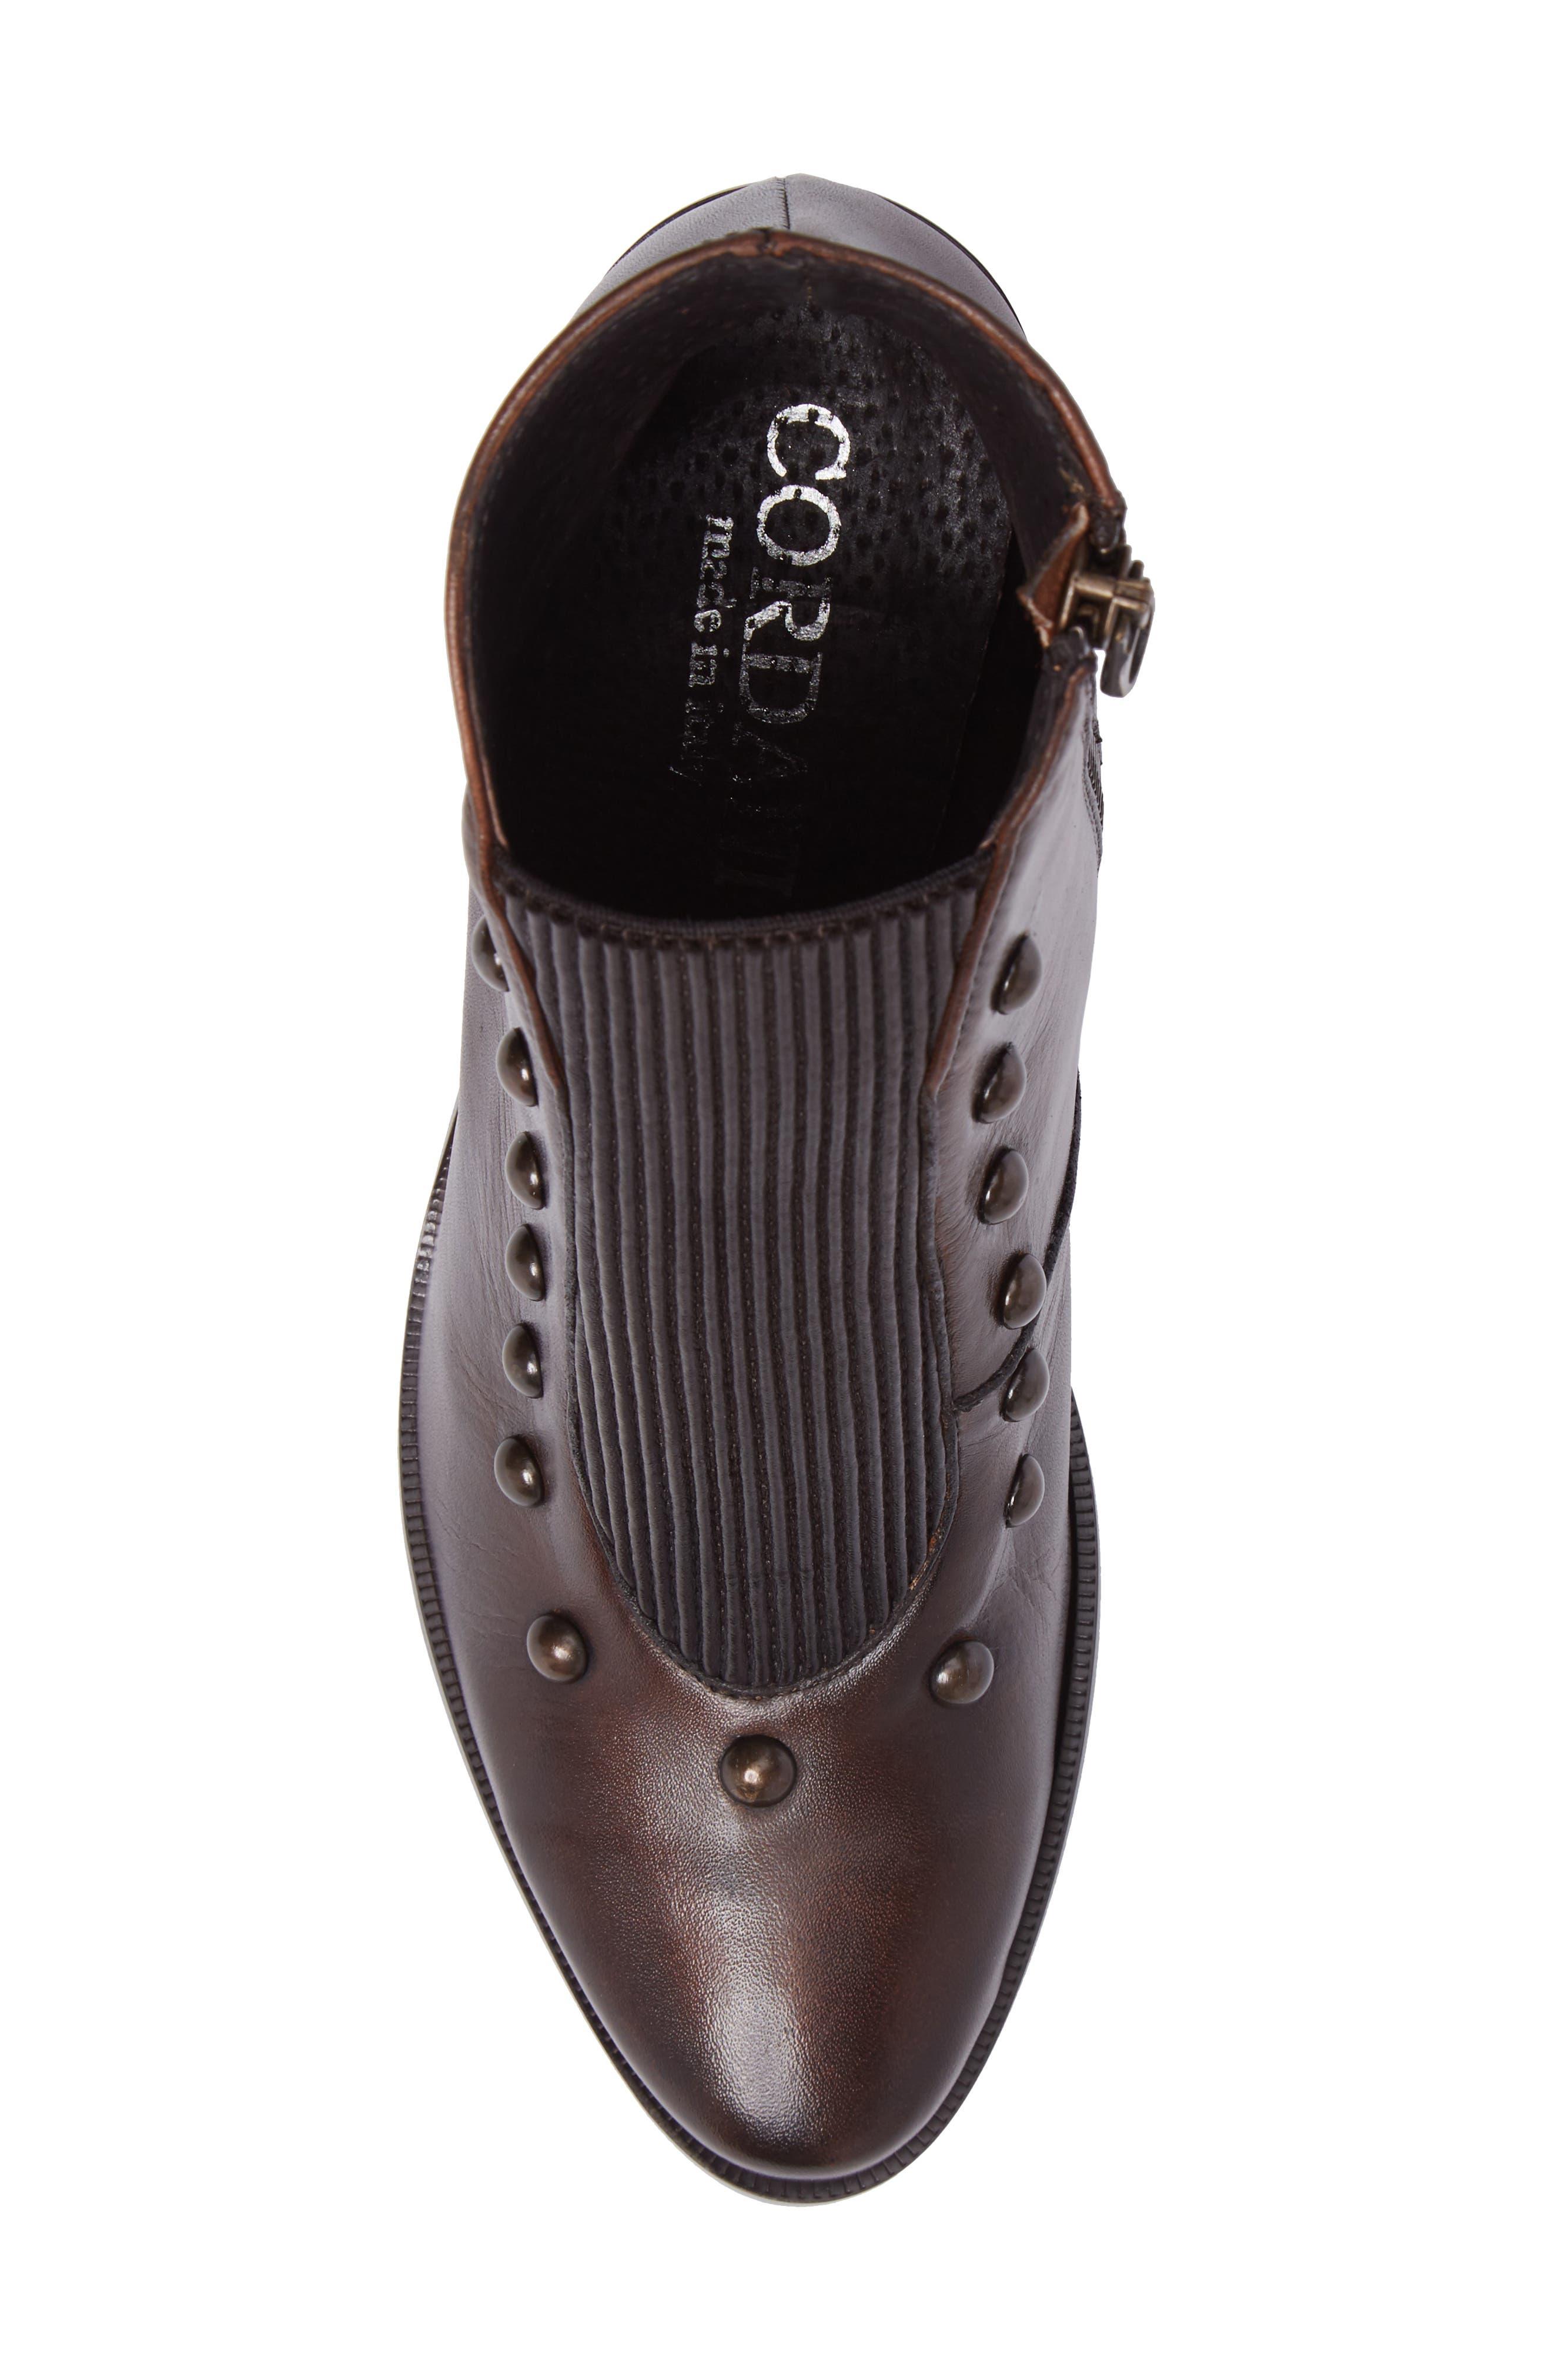 Beatrix Studded Bootie,                             Alternate thumbnail 5, color,                             Deer Leather